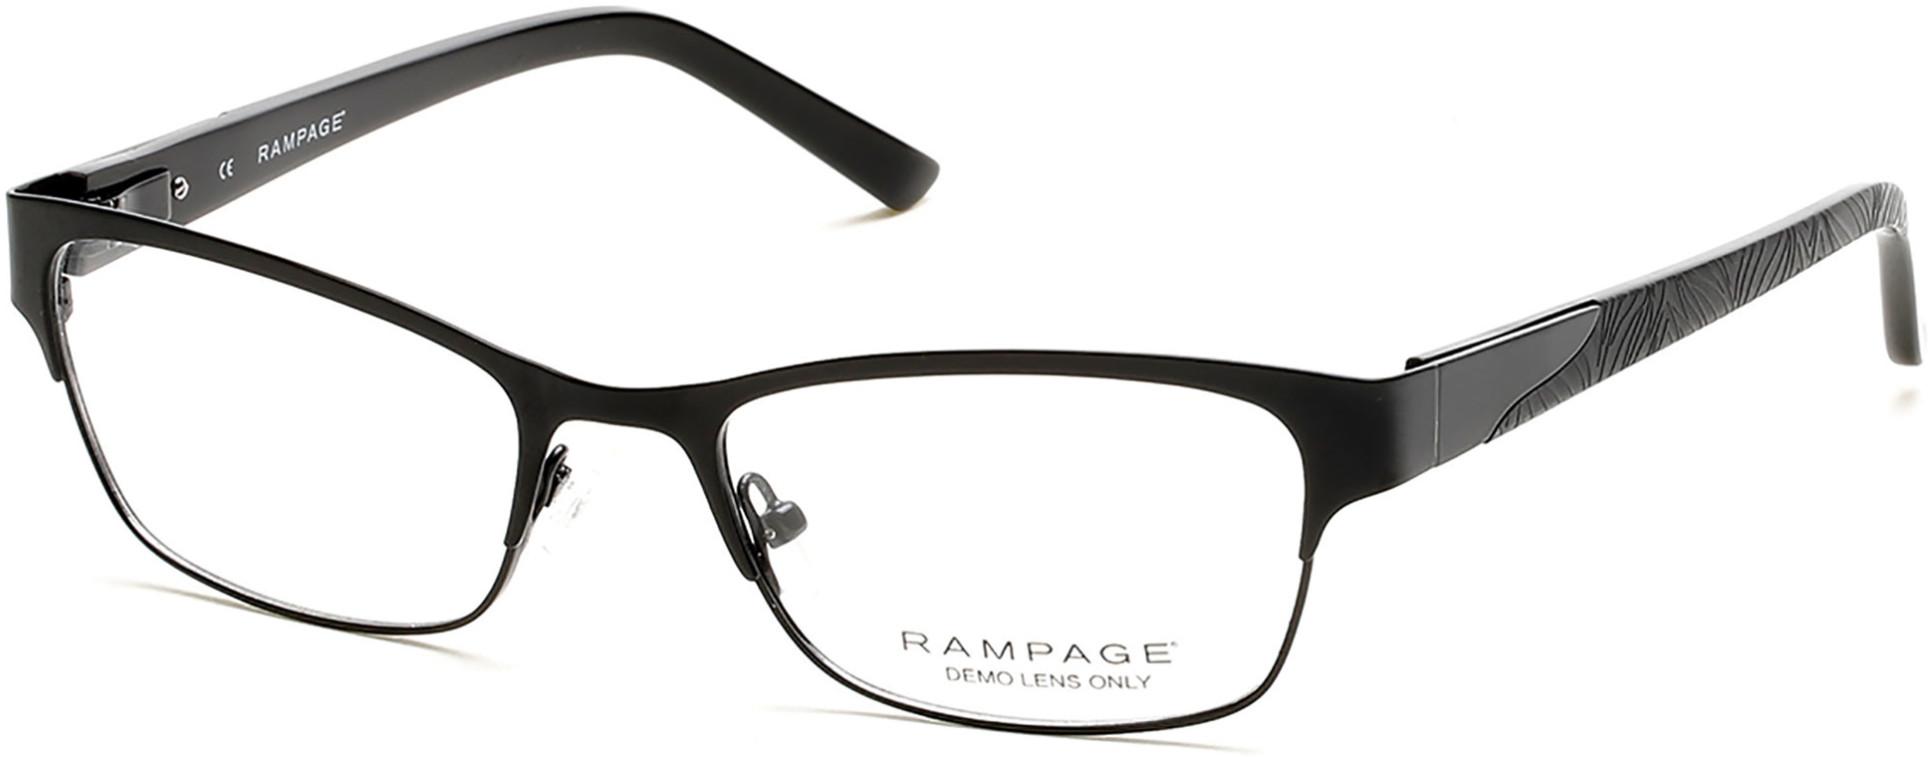 RAMPAGE RA0194 style-color 001 - Shiny Black